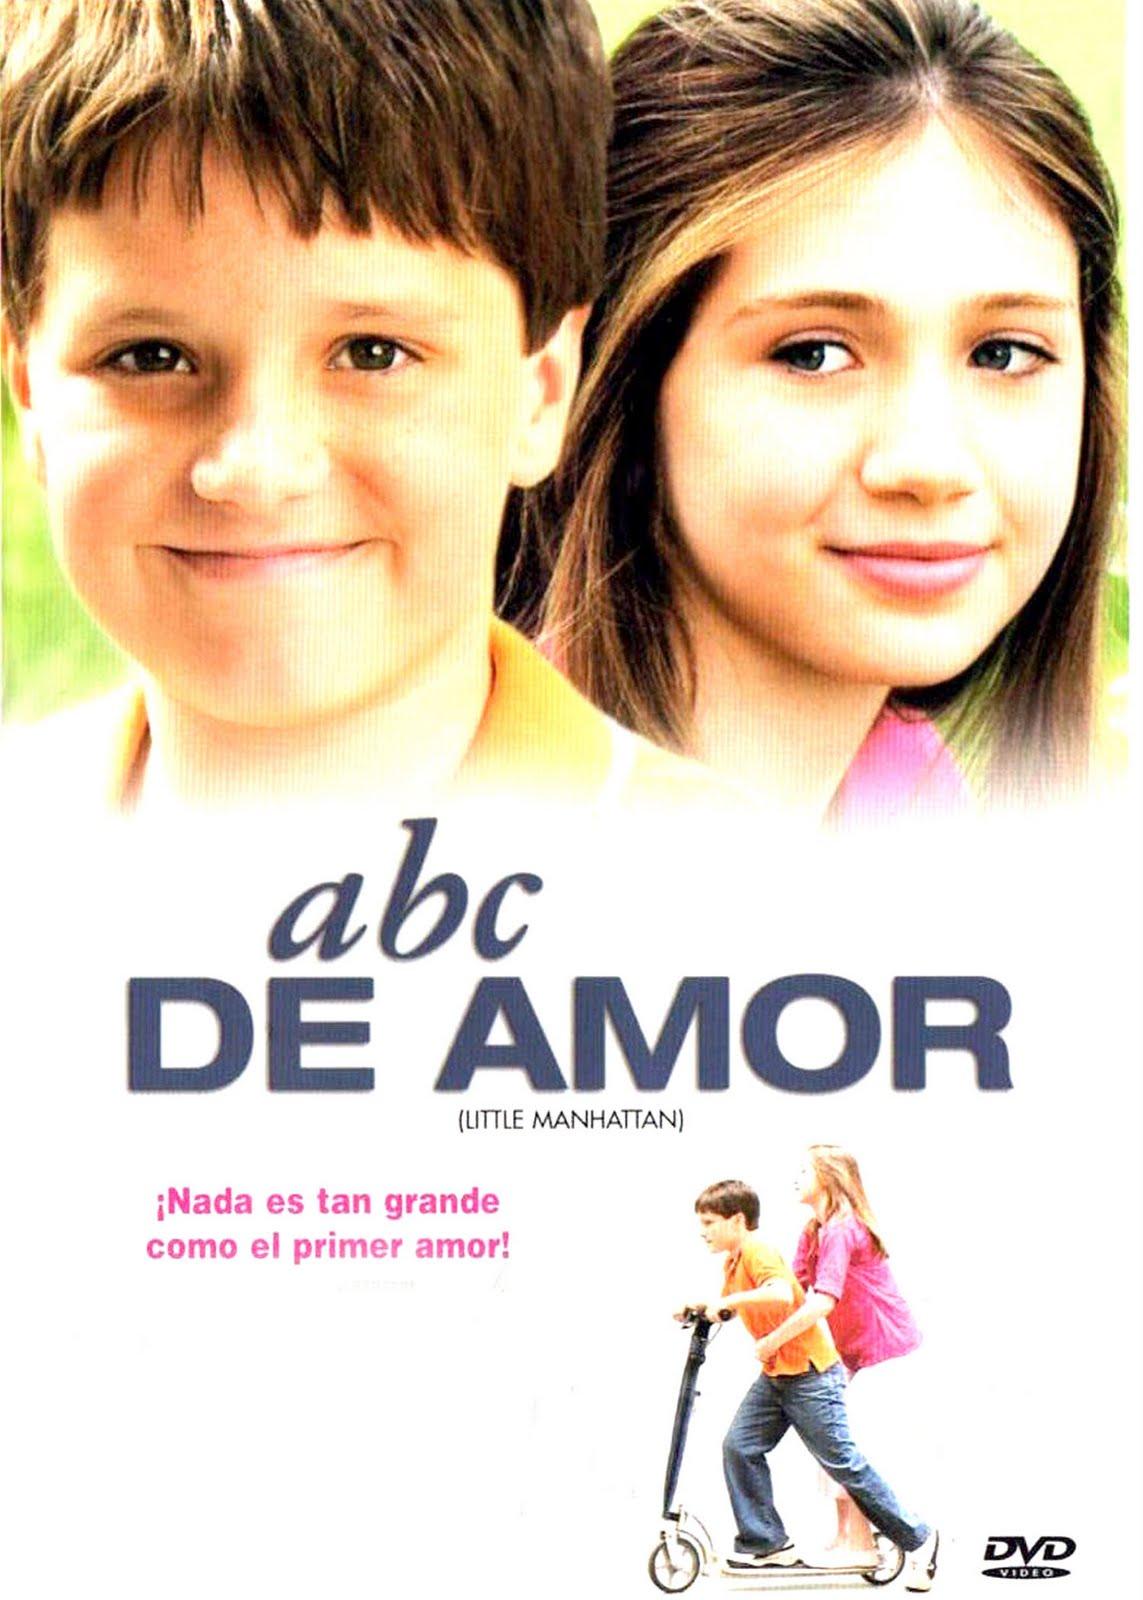 Watch & Download Movies/ver Pelicula Abc Del Amor | My Blog